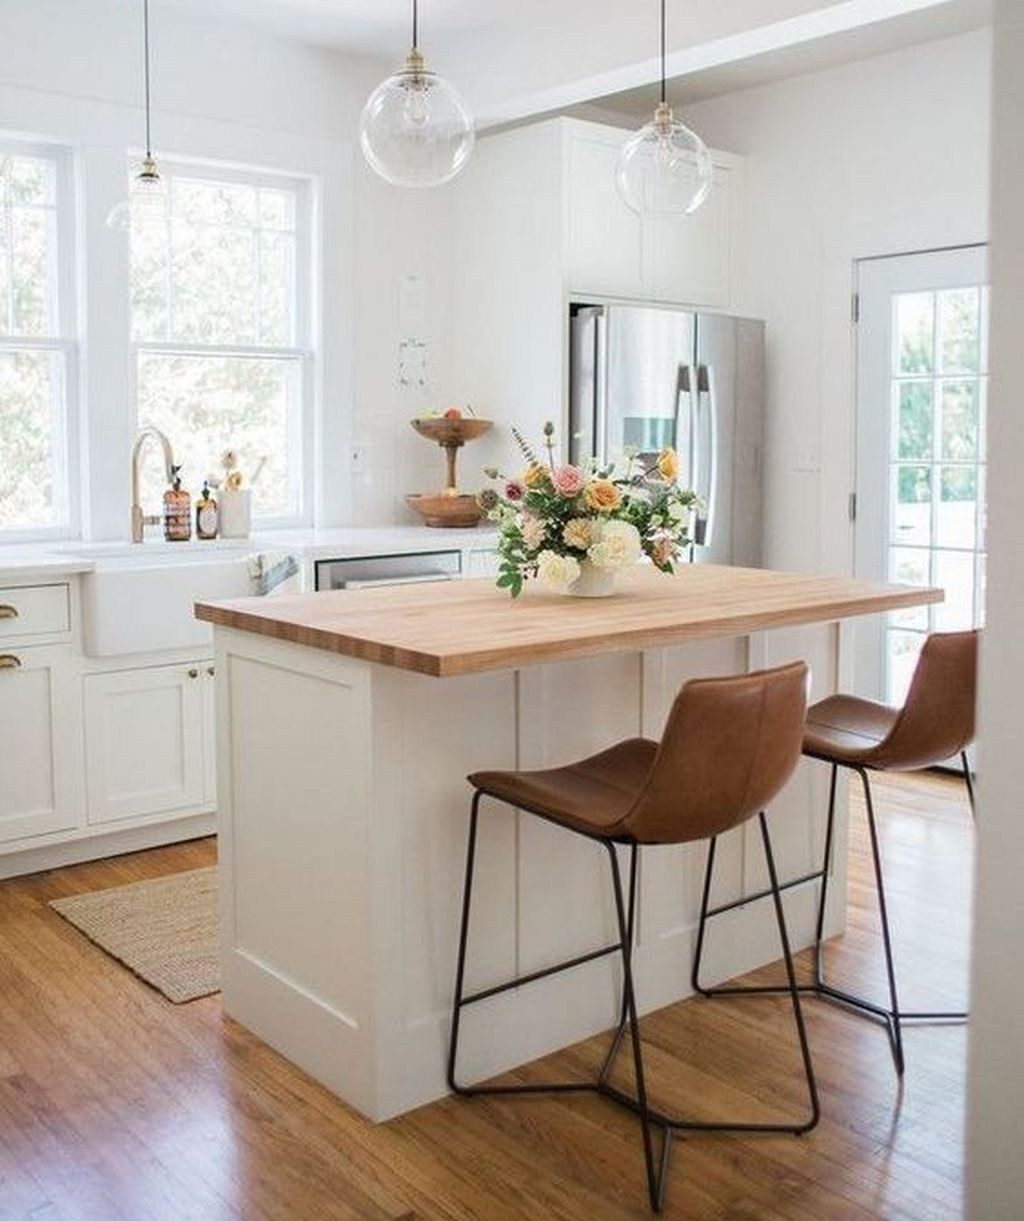 Relaxing Kitchen Designs Ideas 05 kitchen #relaxing #kitchen #designs #ideas #05